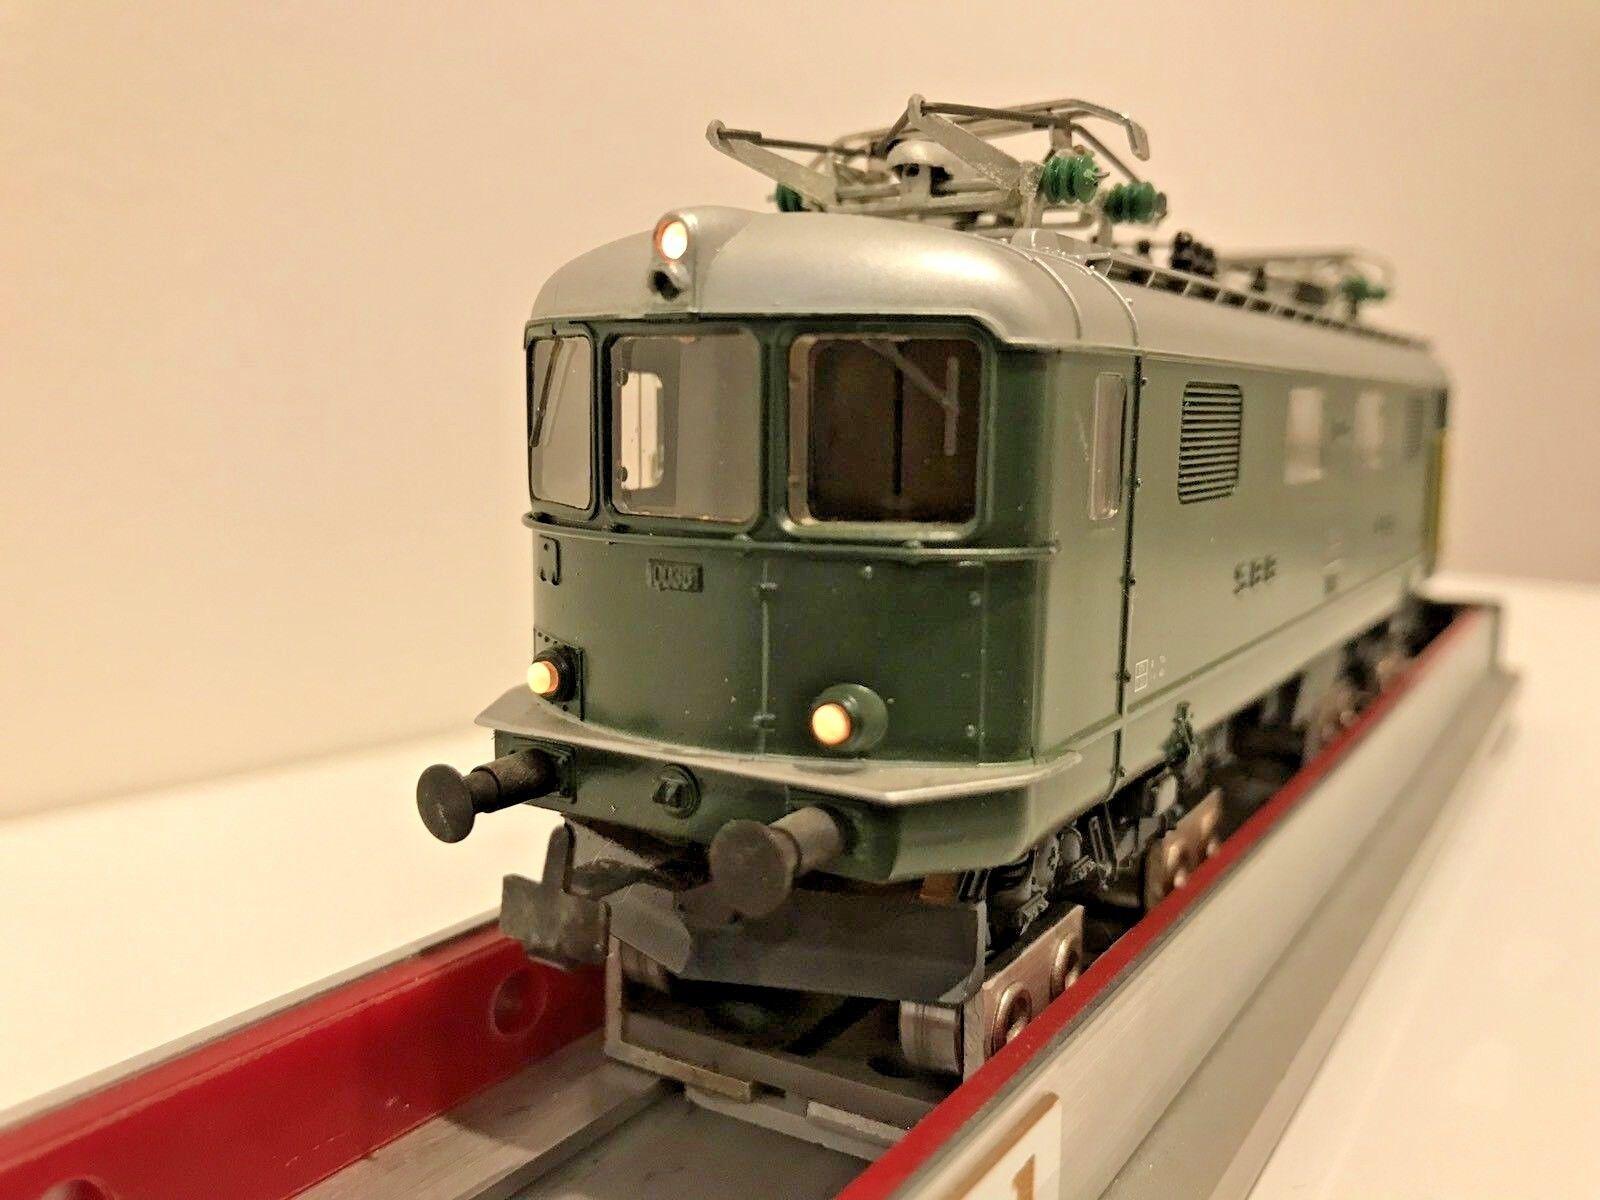 HAG Nr. 221 - Locomotive Électrique Re 4 4 I SBB   CFF en H, état neuf